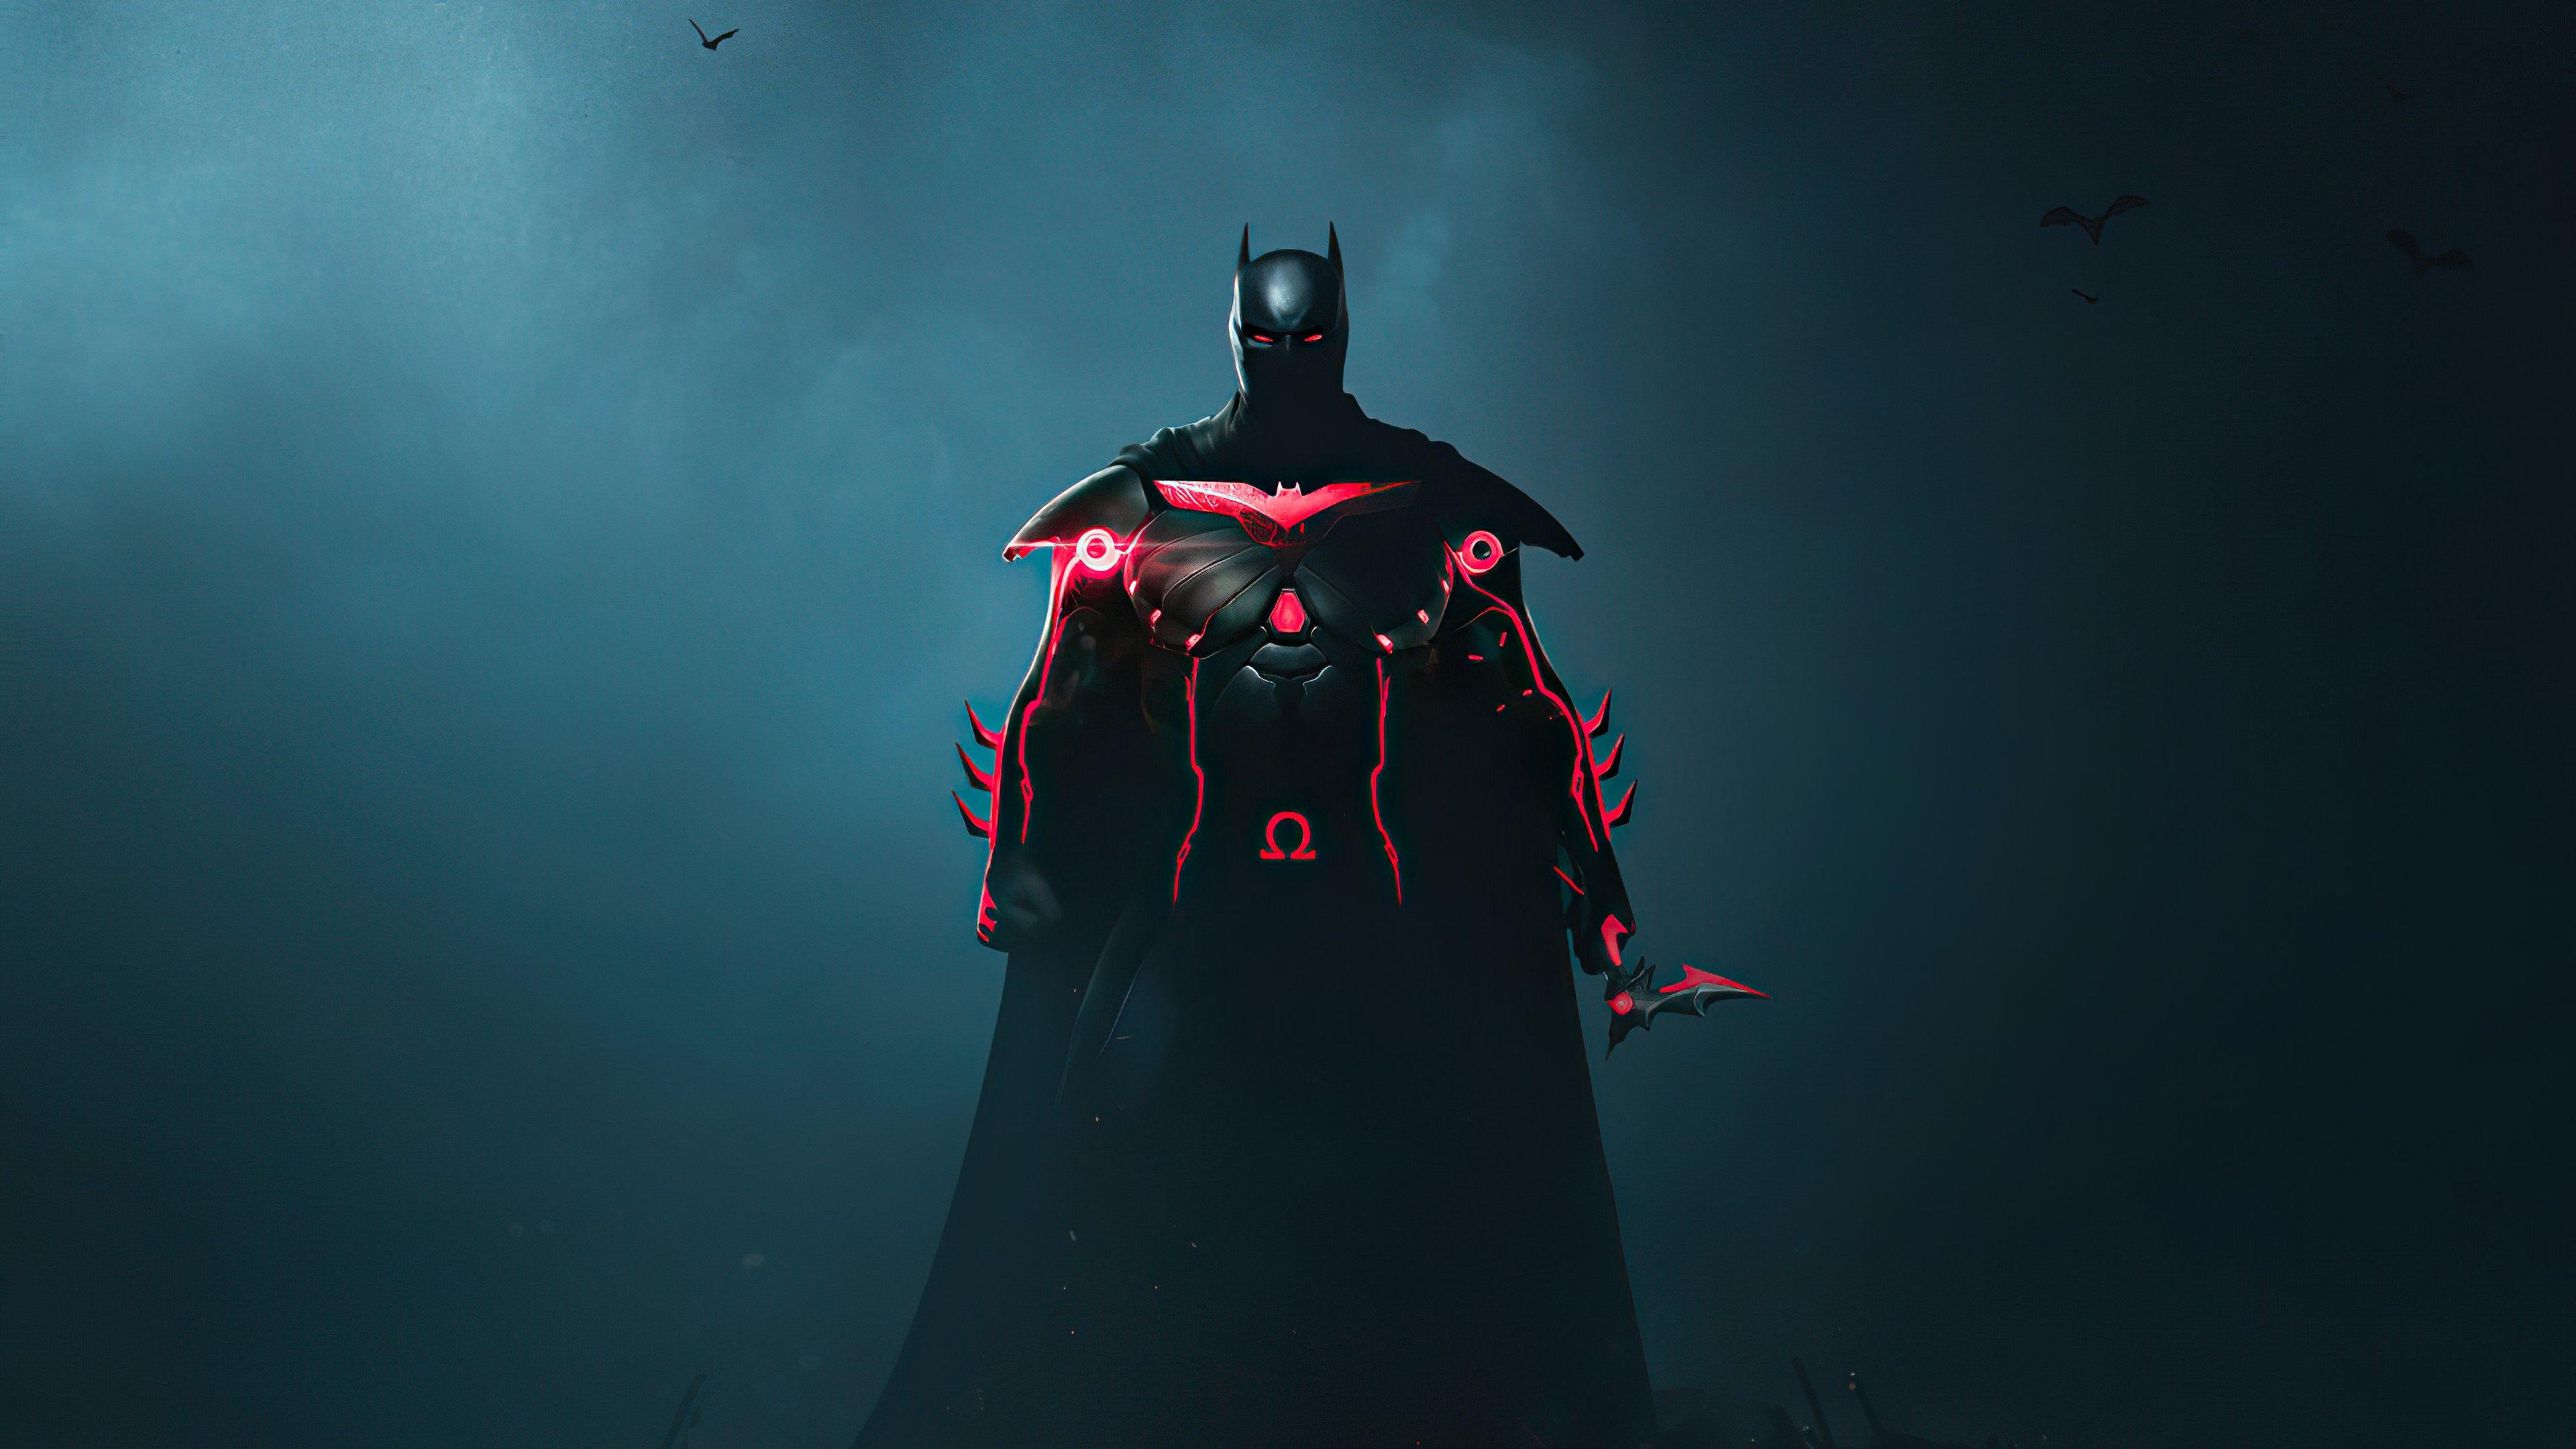 Wallpaper Batman Apocalypse